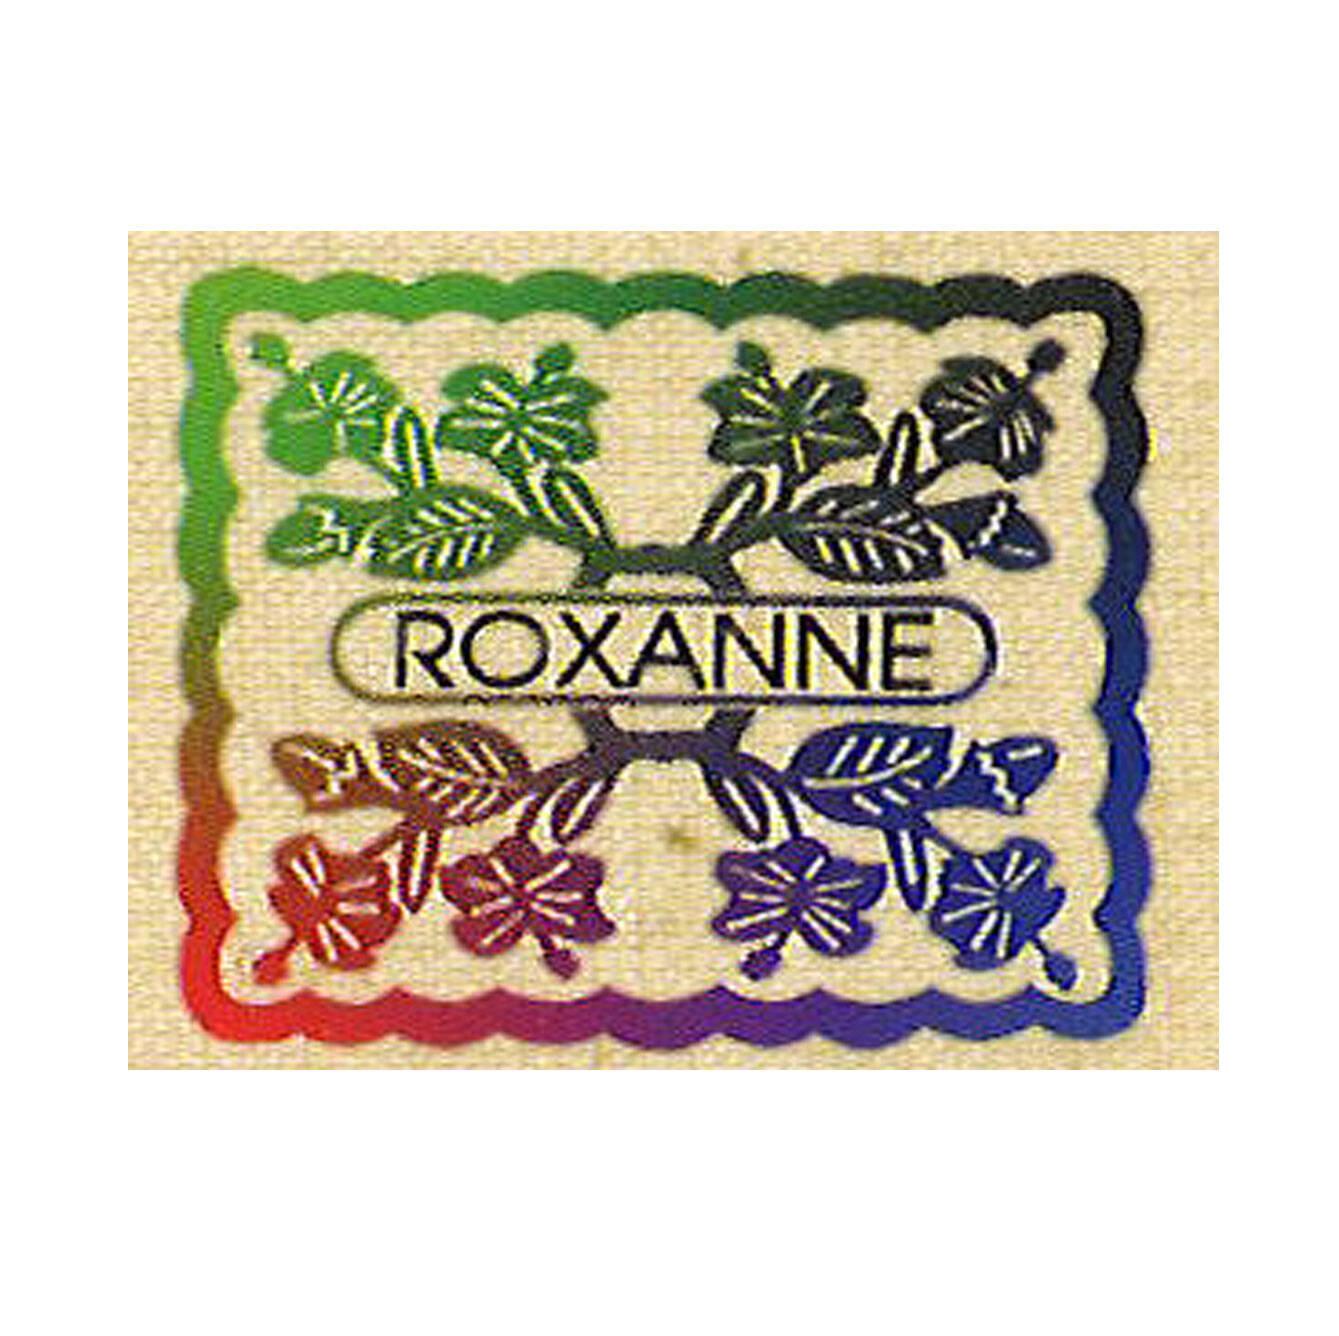 Roxanne International